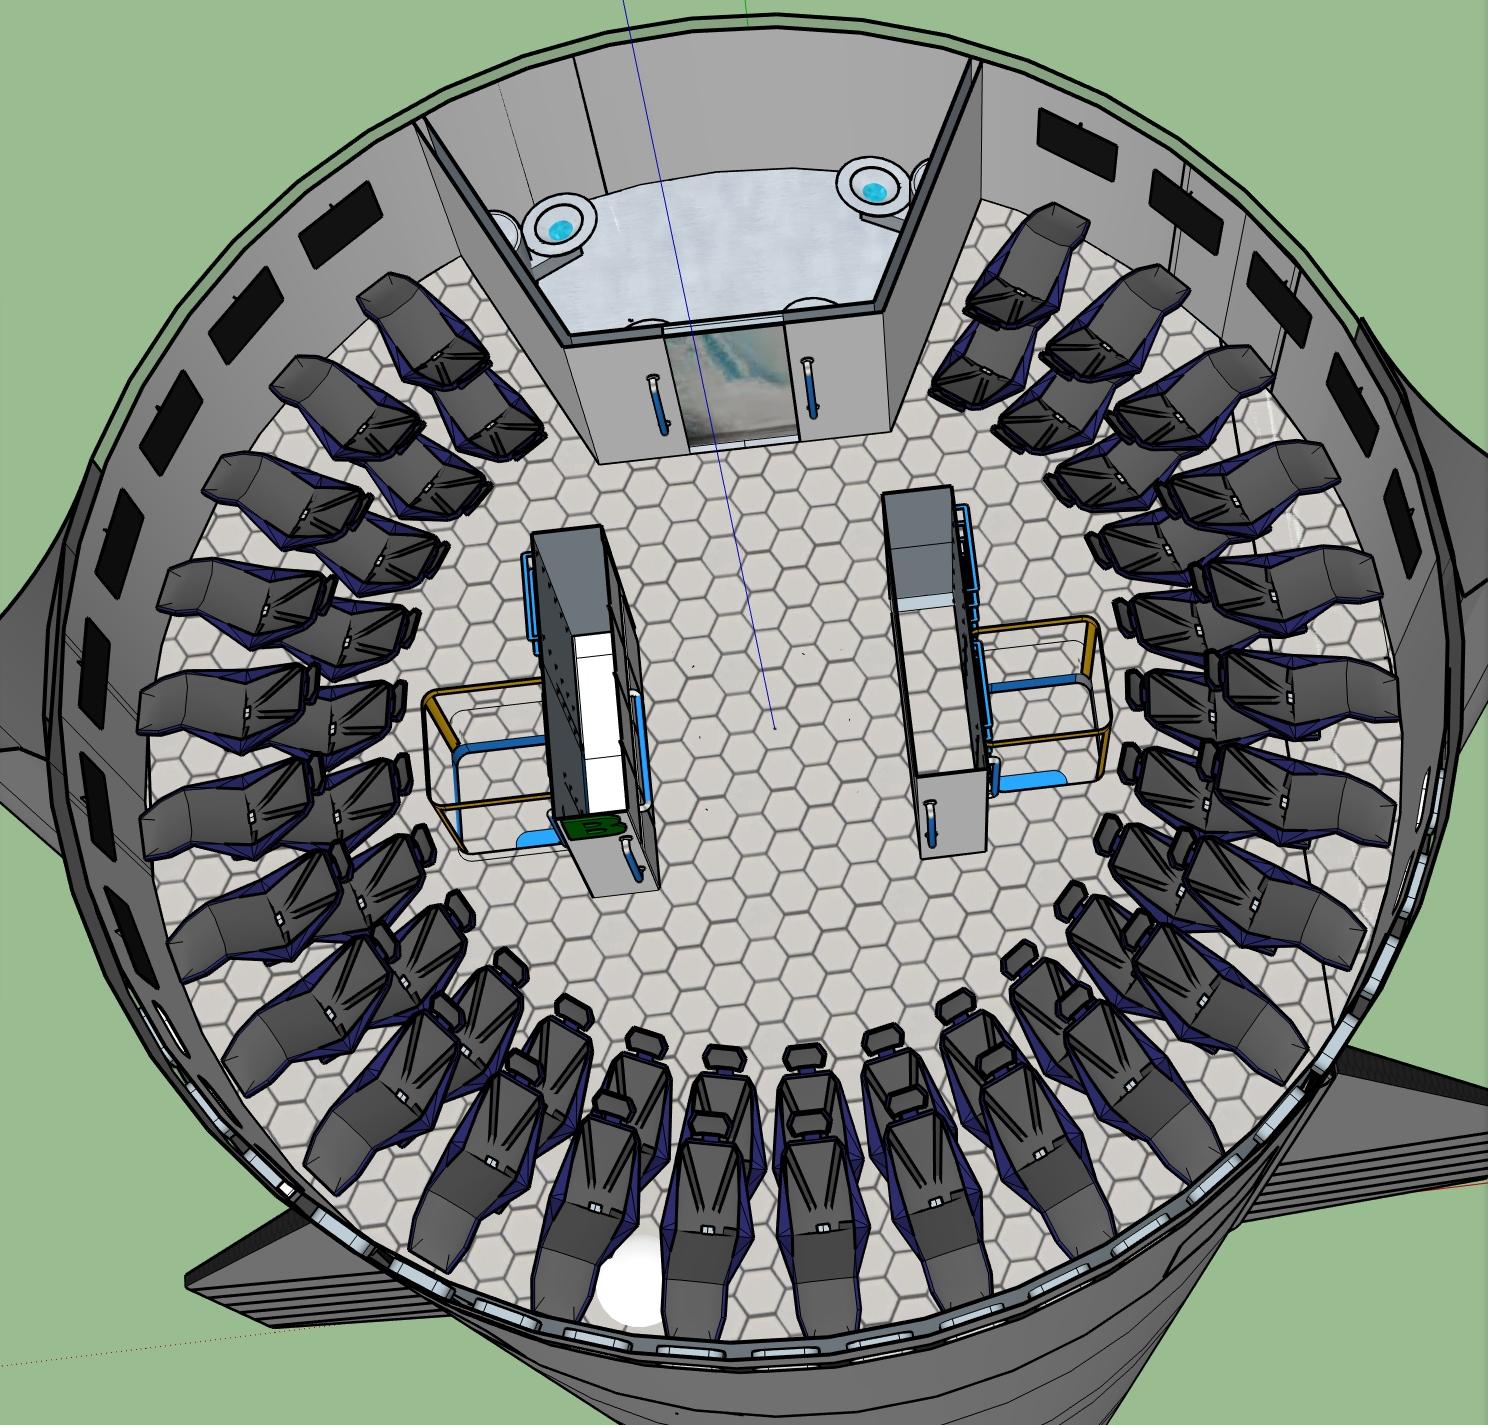 Spacex Starship Interior - Cutaway Diagram Of Spacex Starship Spacex ...